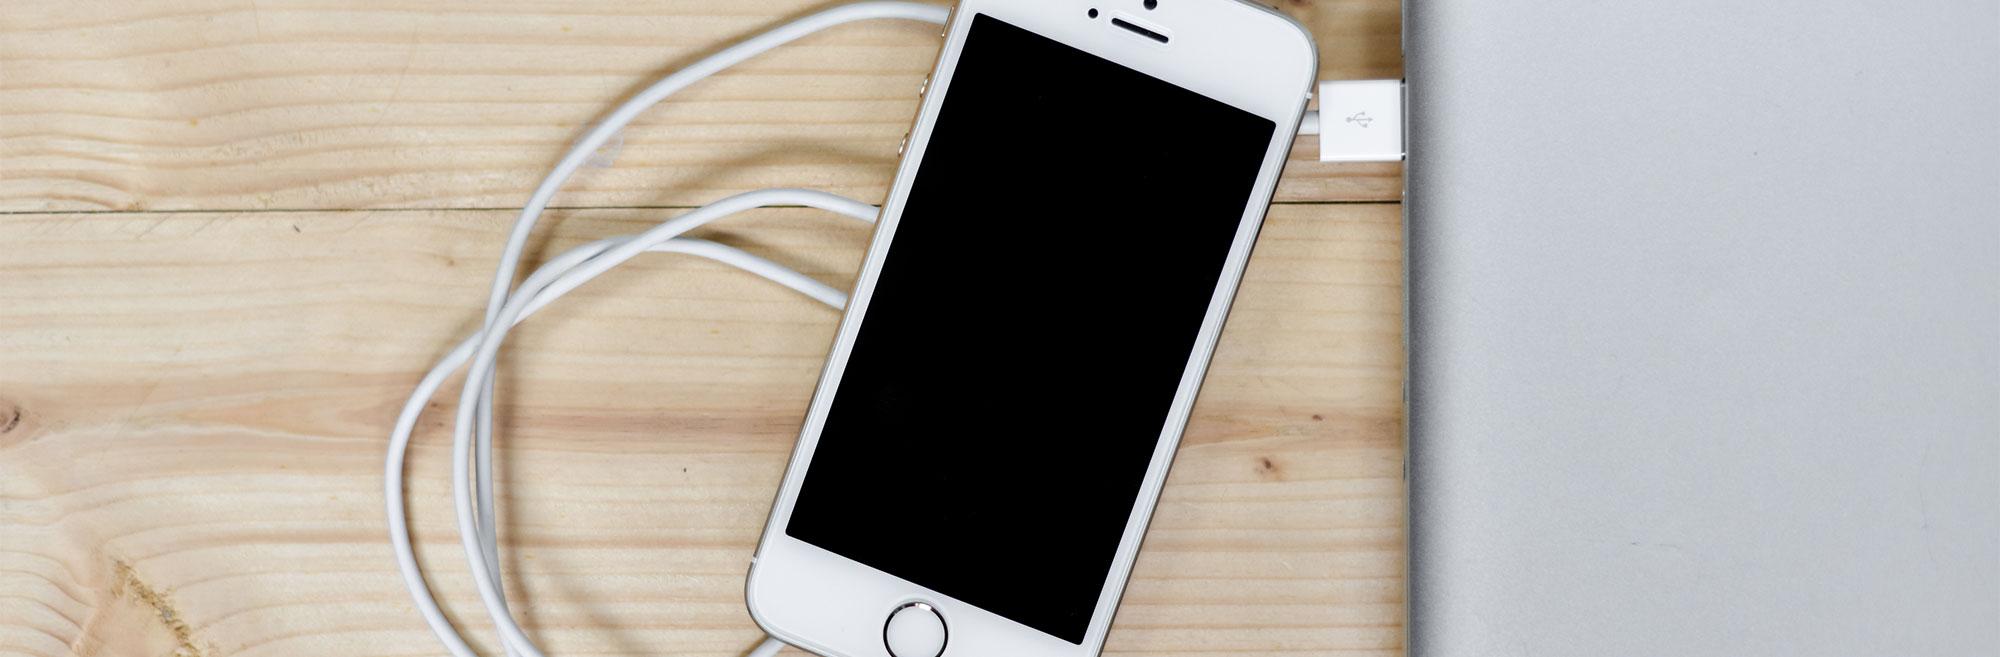 Smartphone Display Flackert